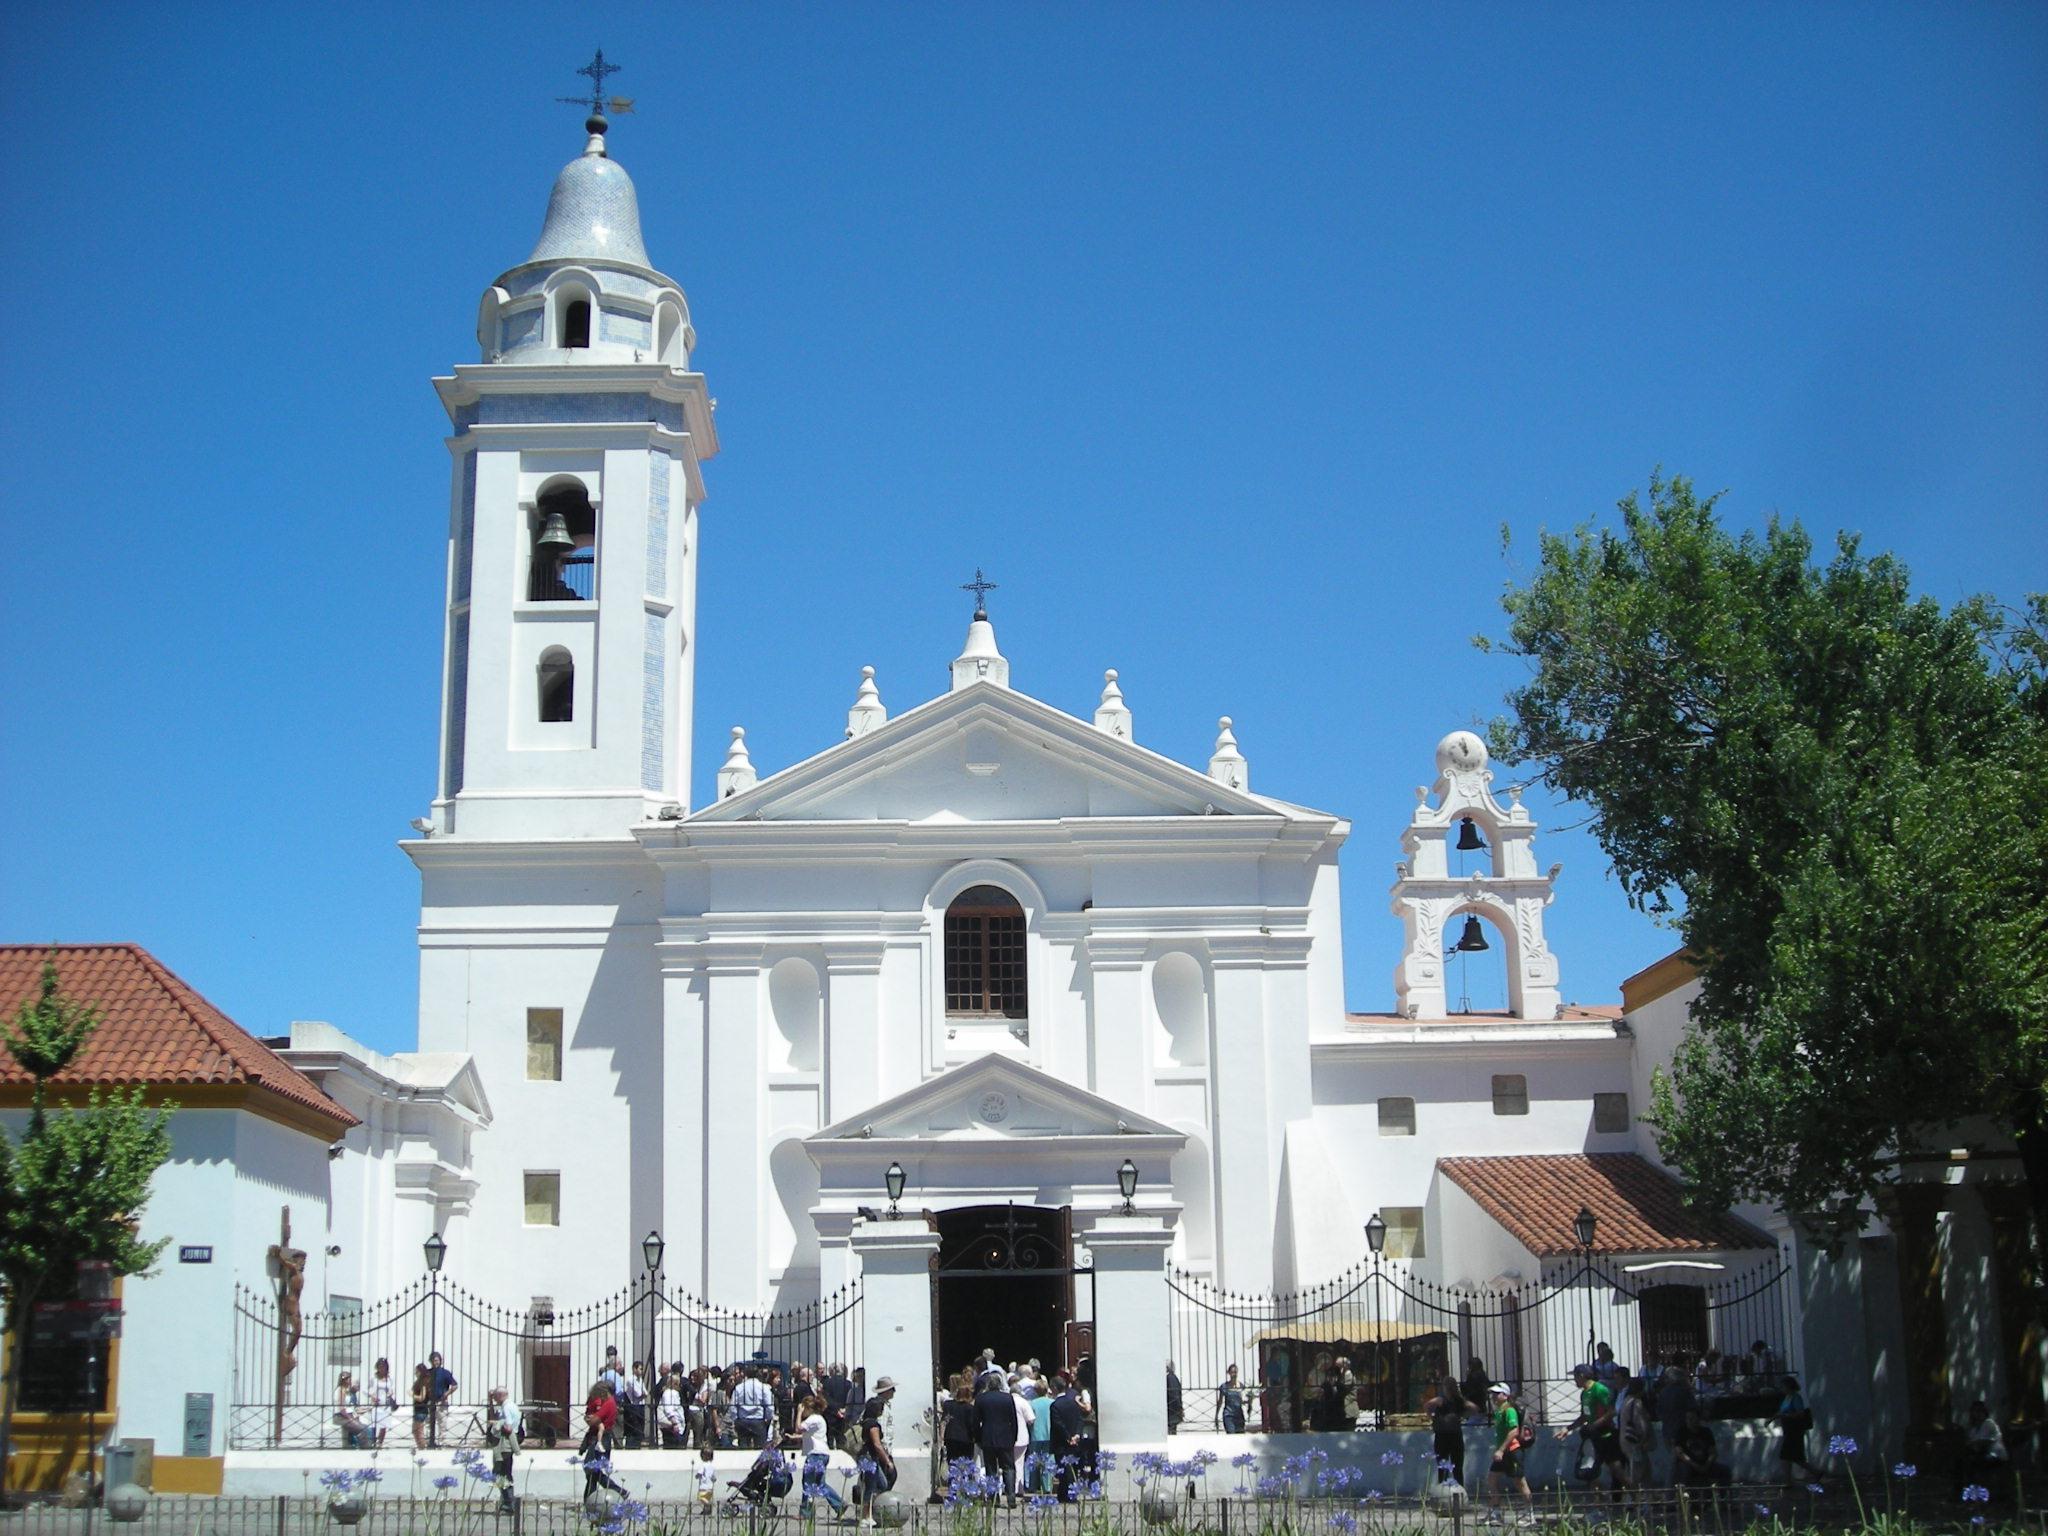 File:Basílica Nuestra Señora del Pilar.JPG - Wikimedia Commons